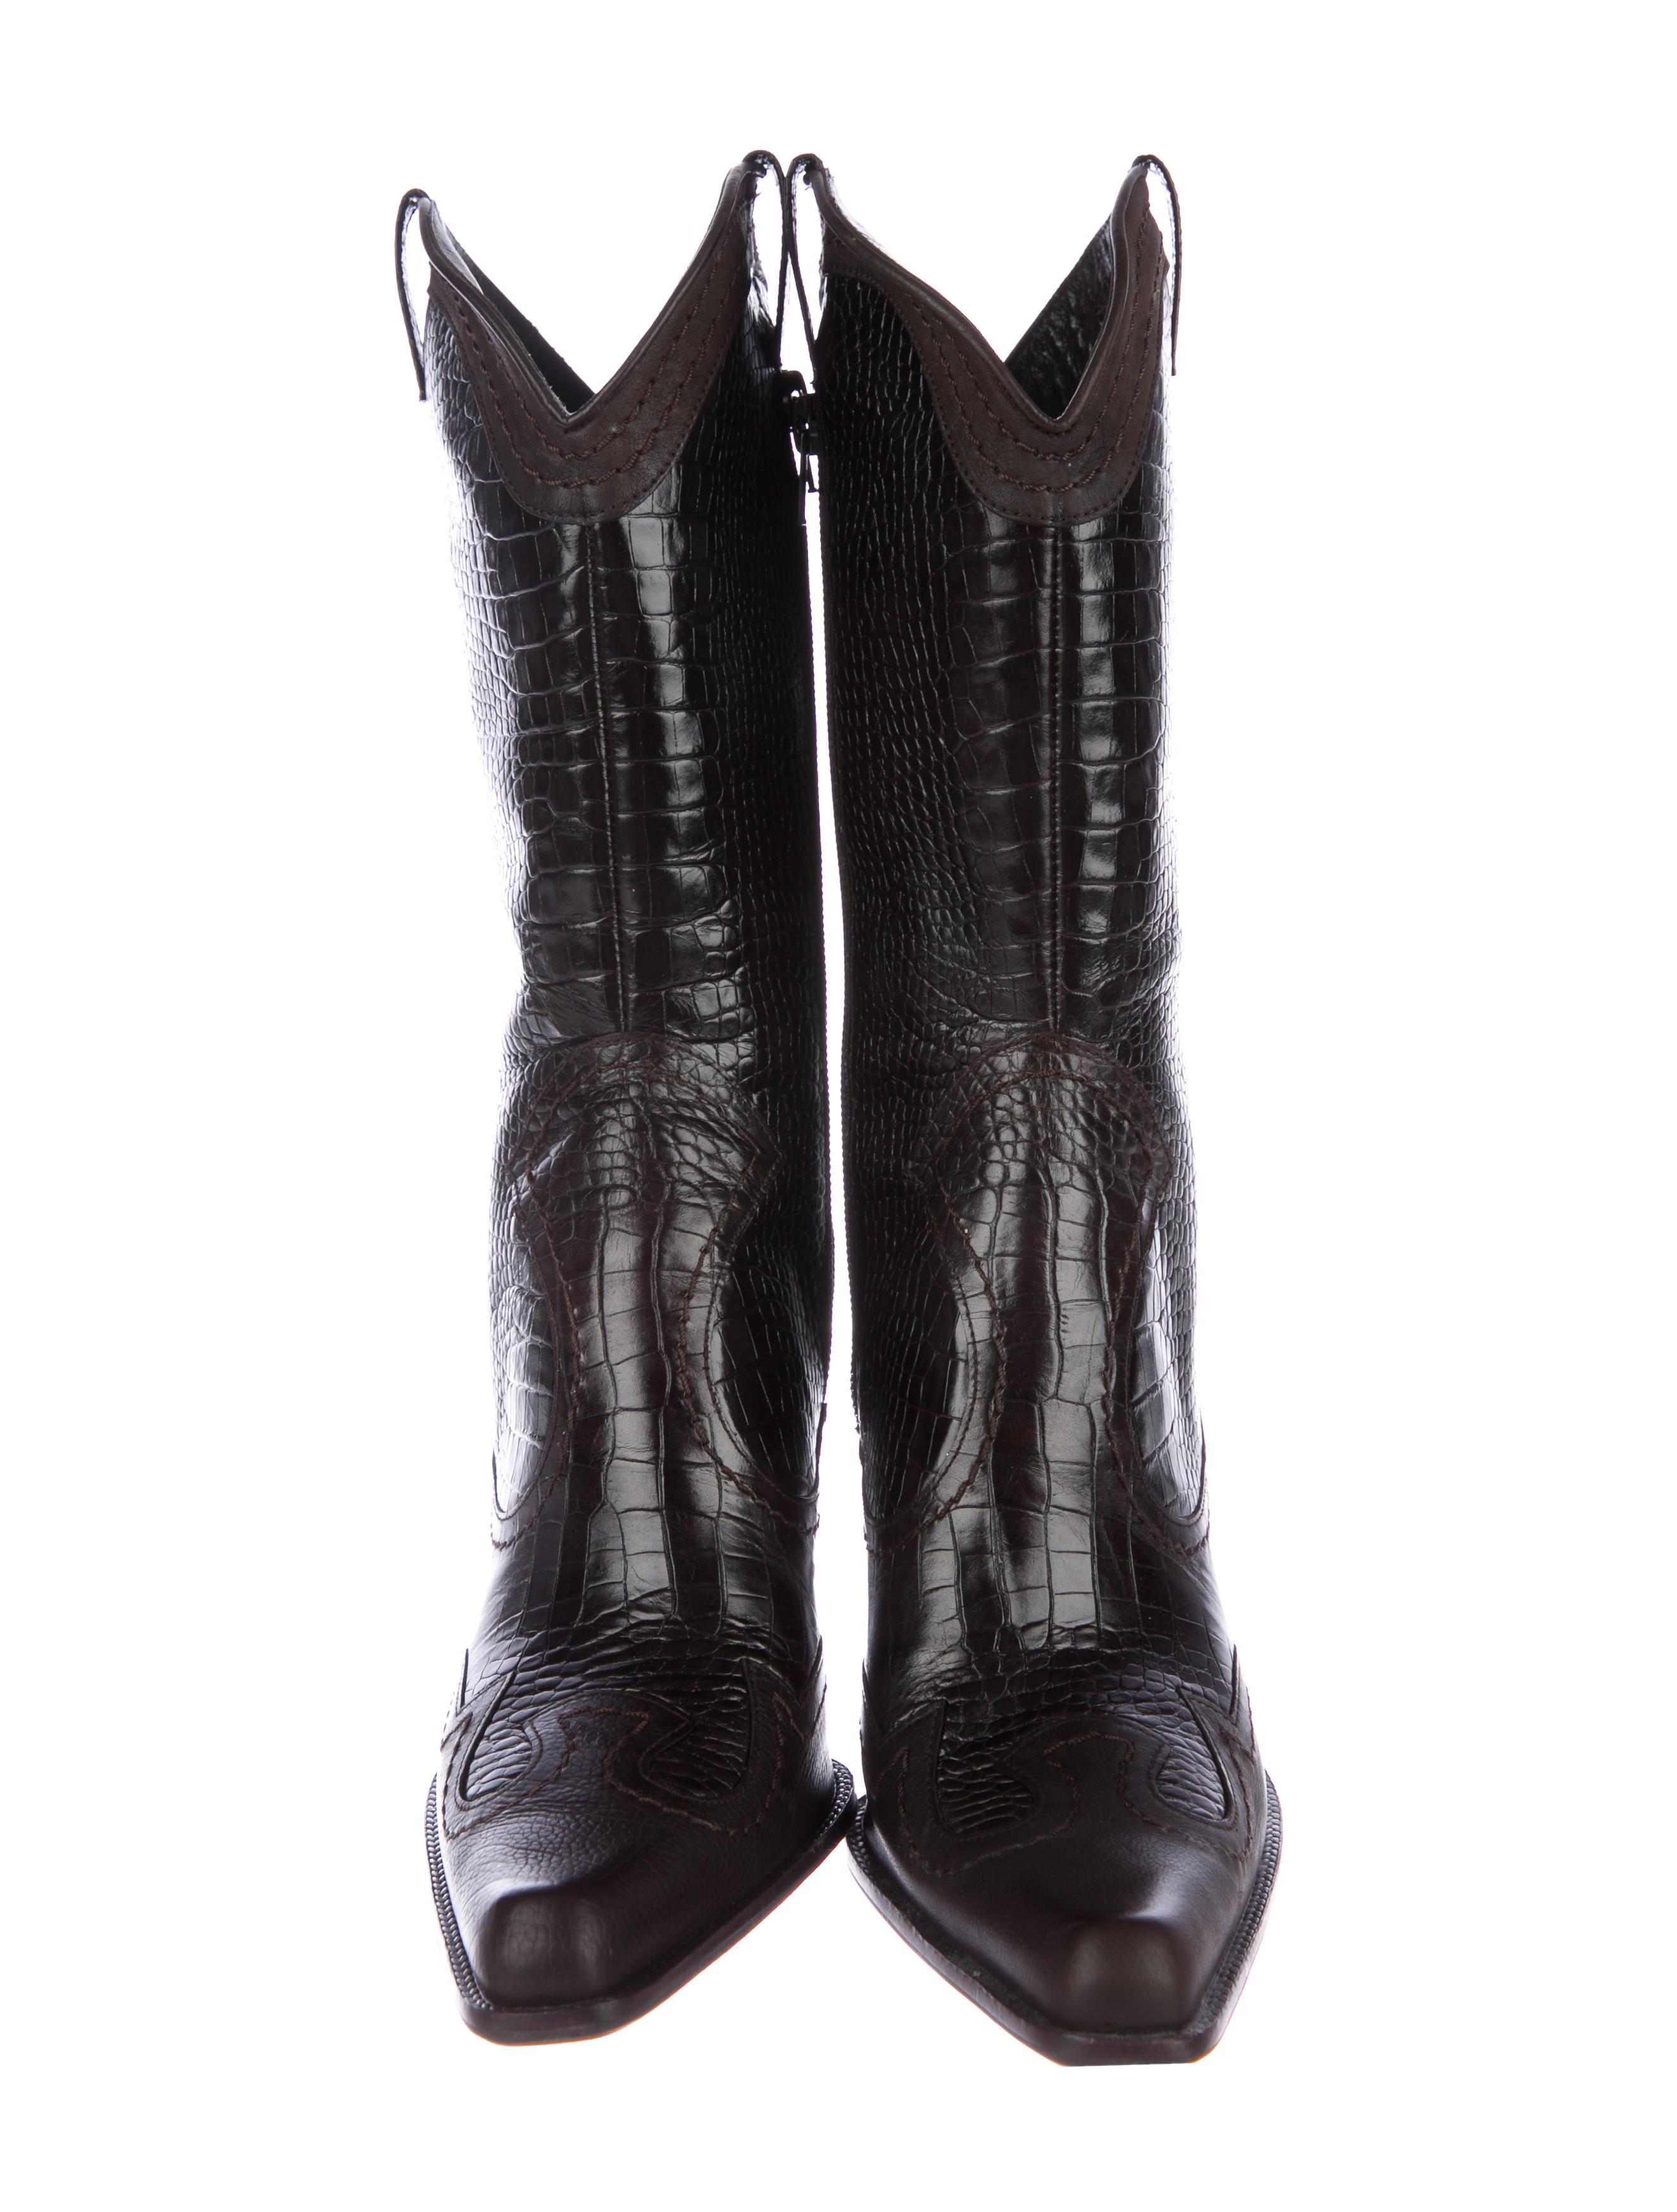 Stuart Weitzman Preston Mid-Calf Boots 2014 cheap online clearance really bynNStjWTJ